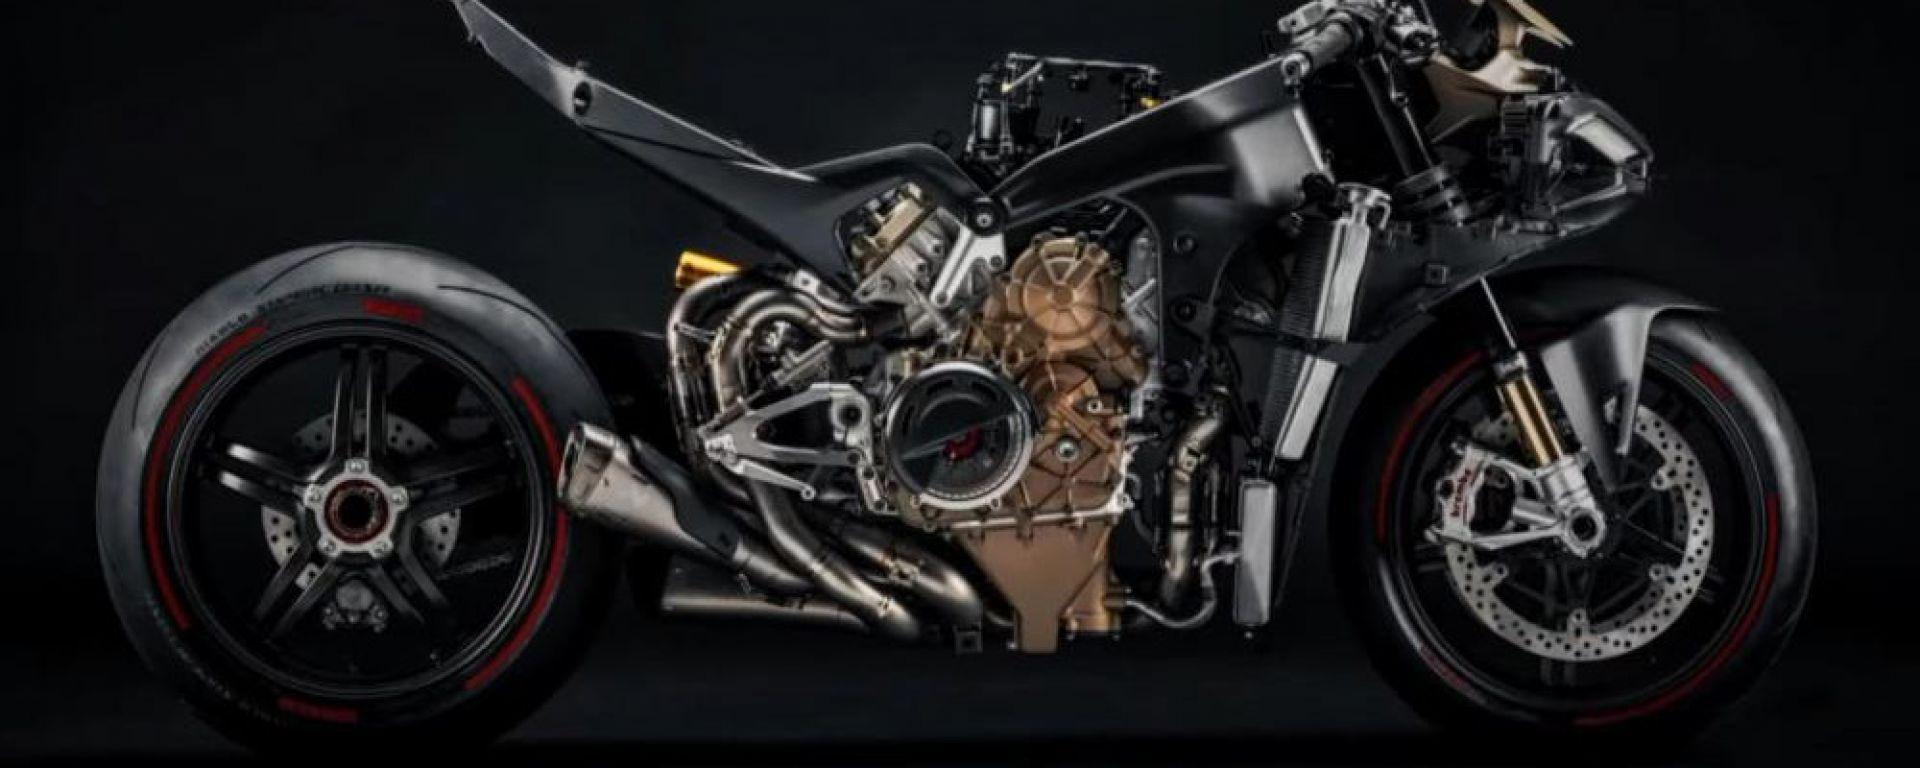 Ducati Panigale V4 Superleggera: vista laterale